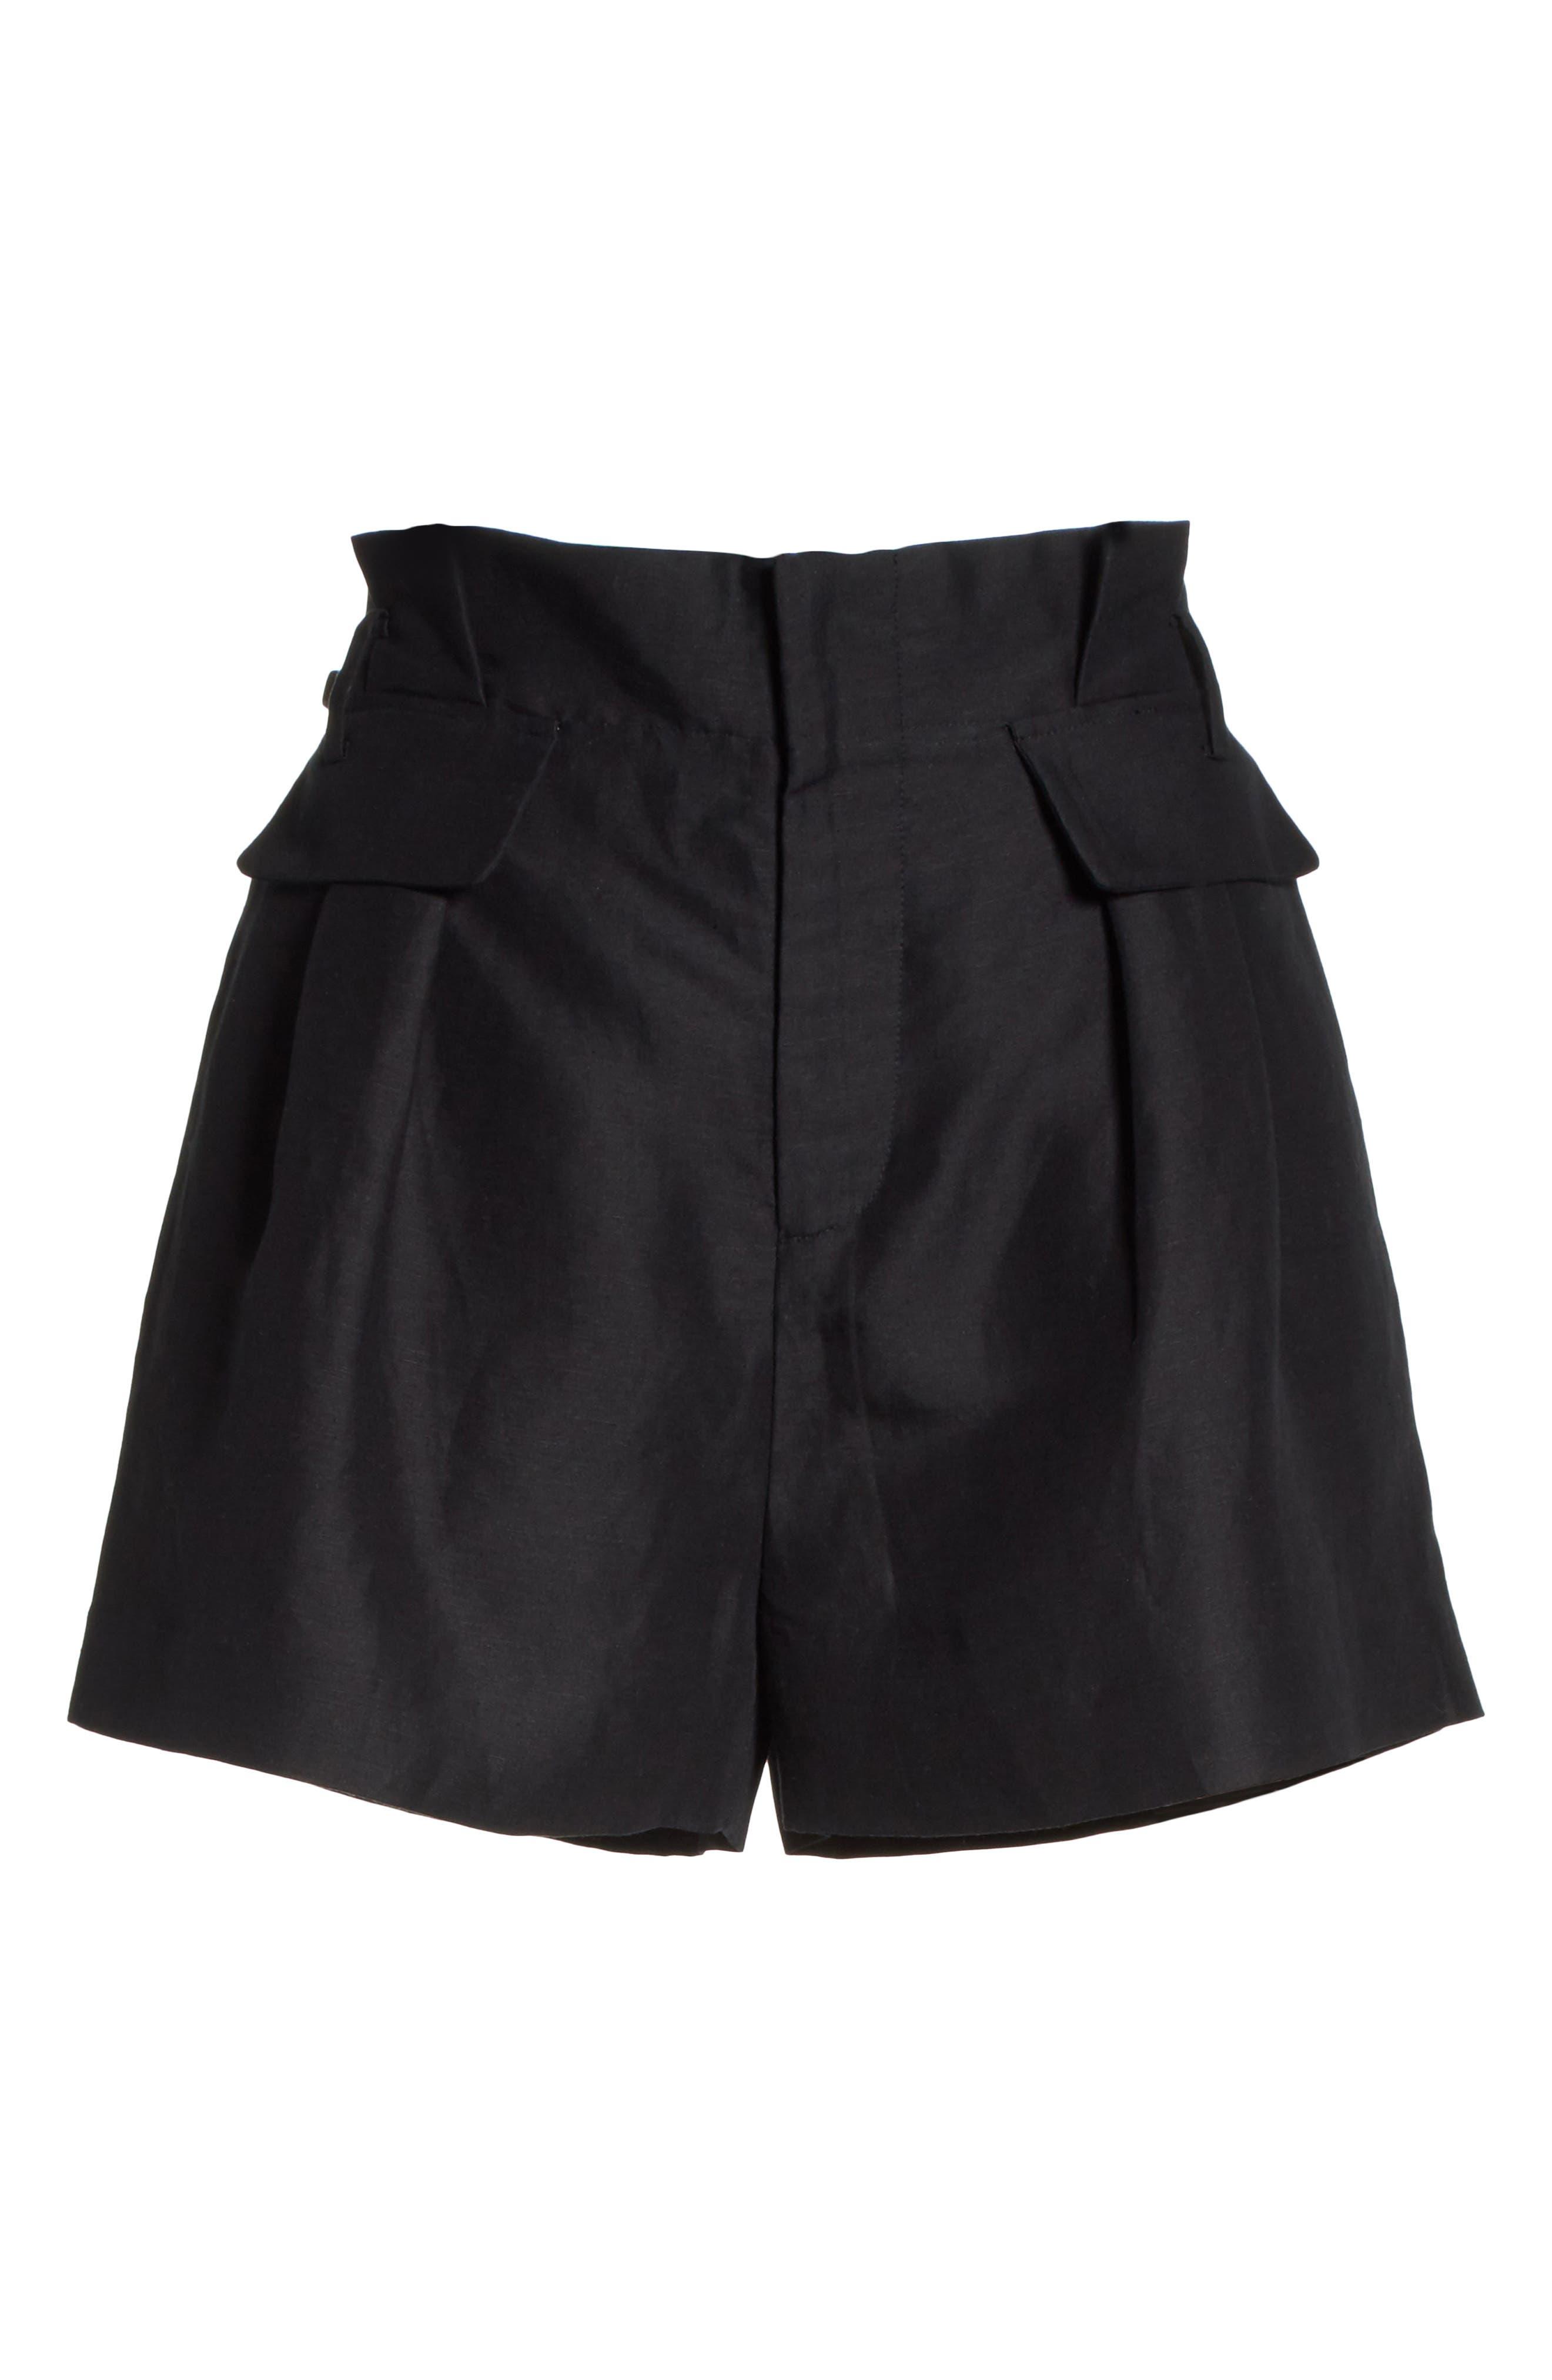 Paperbag Shorts,                             Alternate thumbnail 6, color,                             Noir